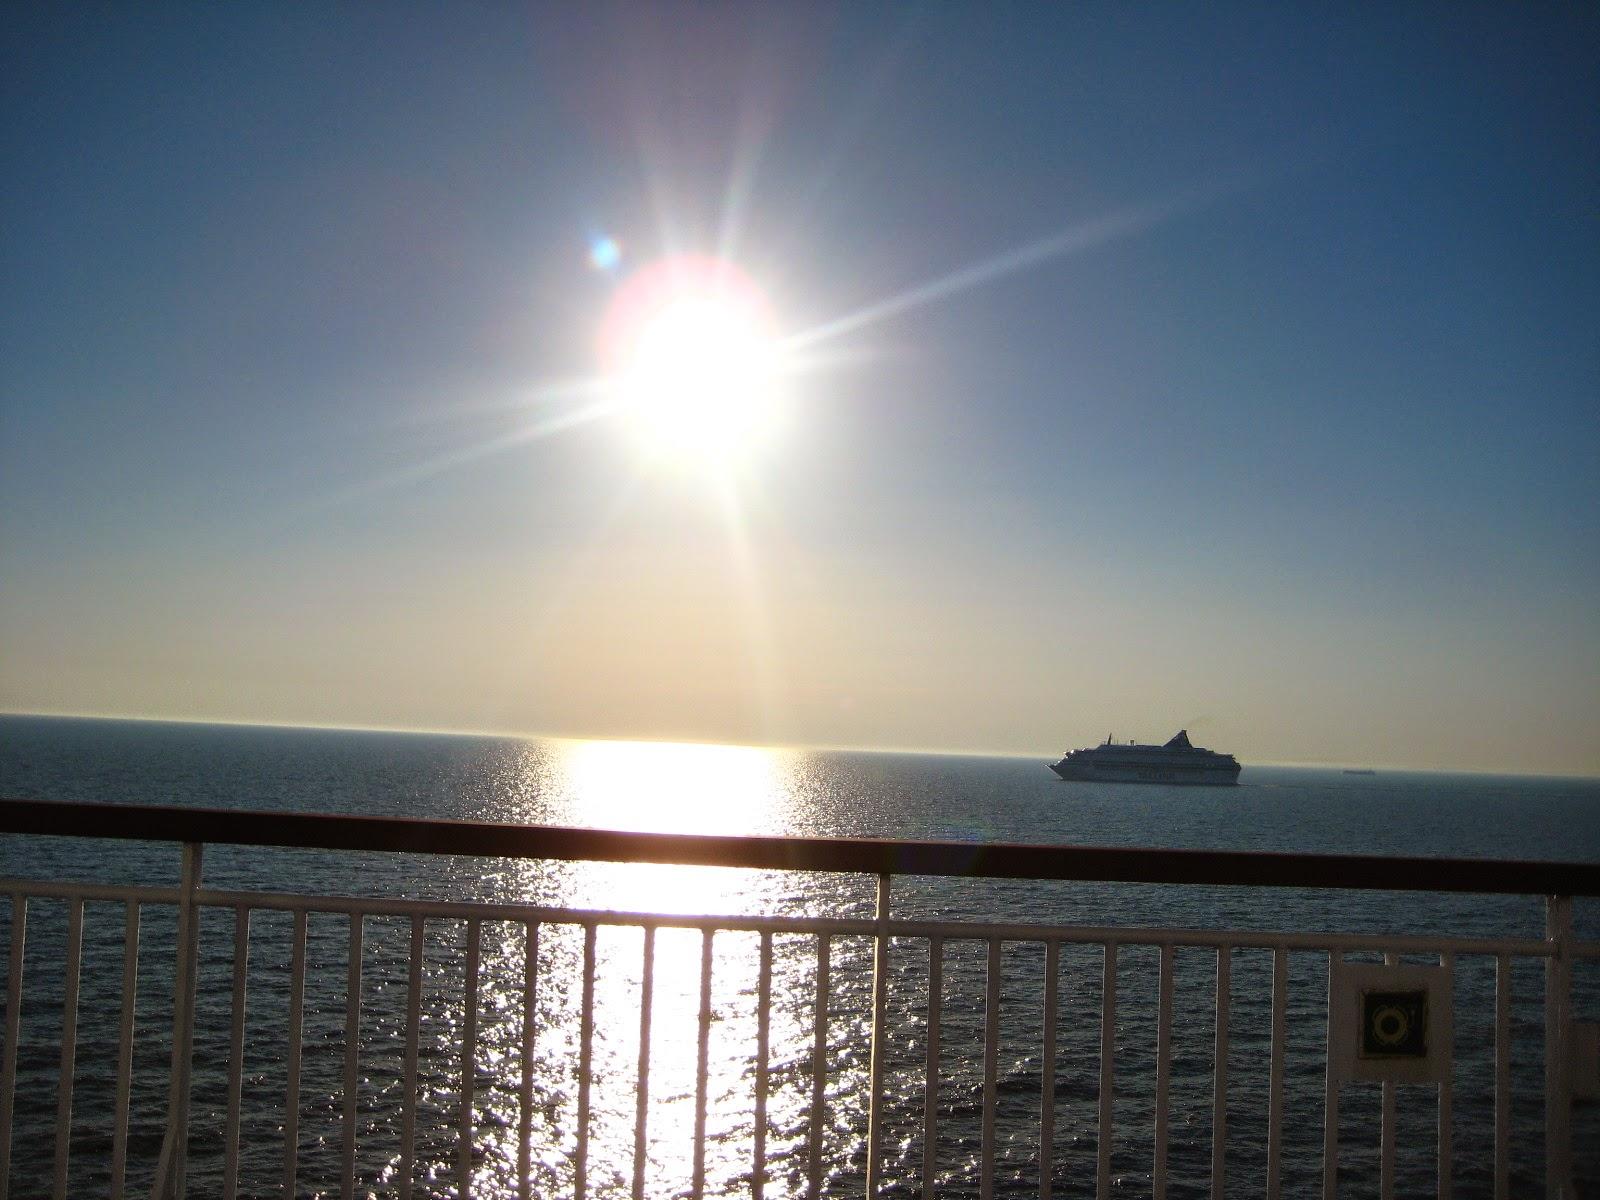 tukholma itämeri meri sea cruise